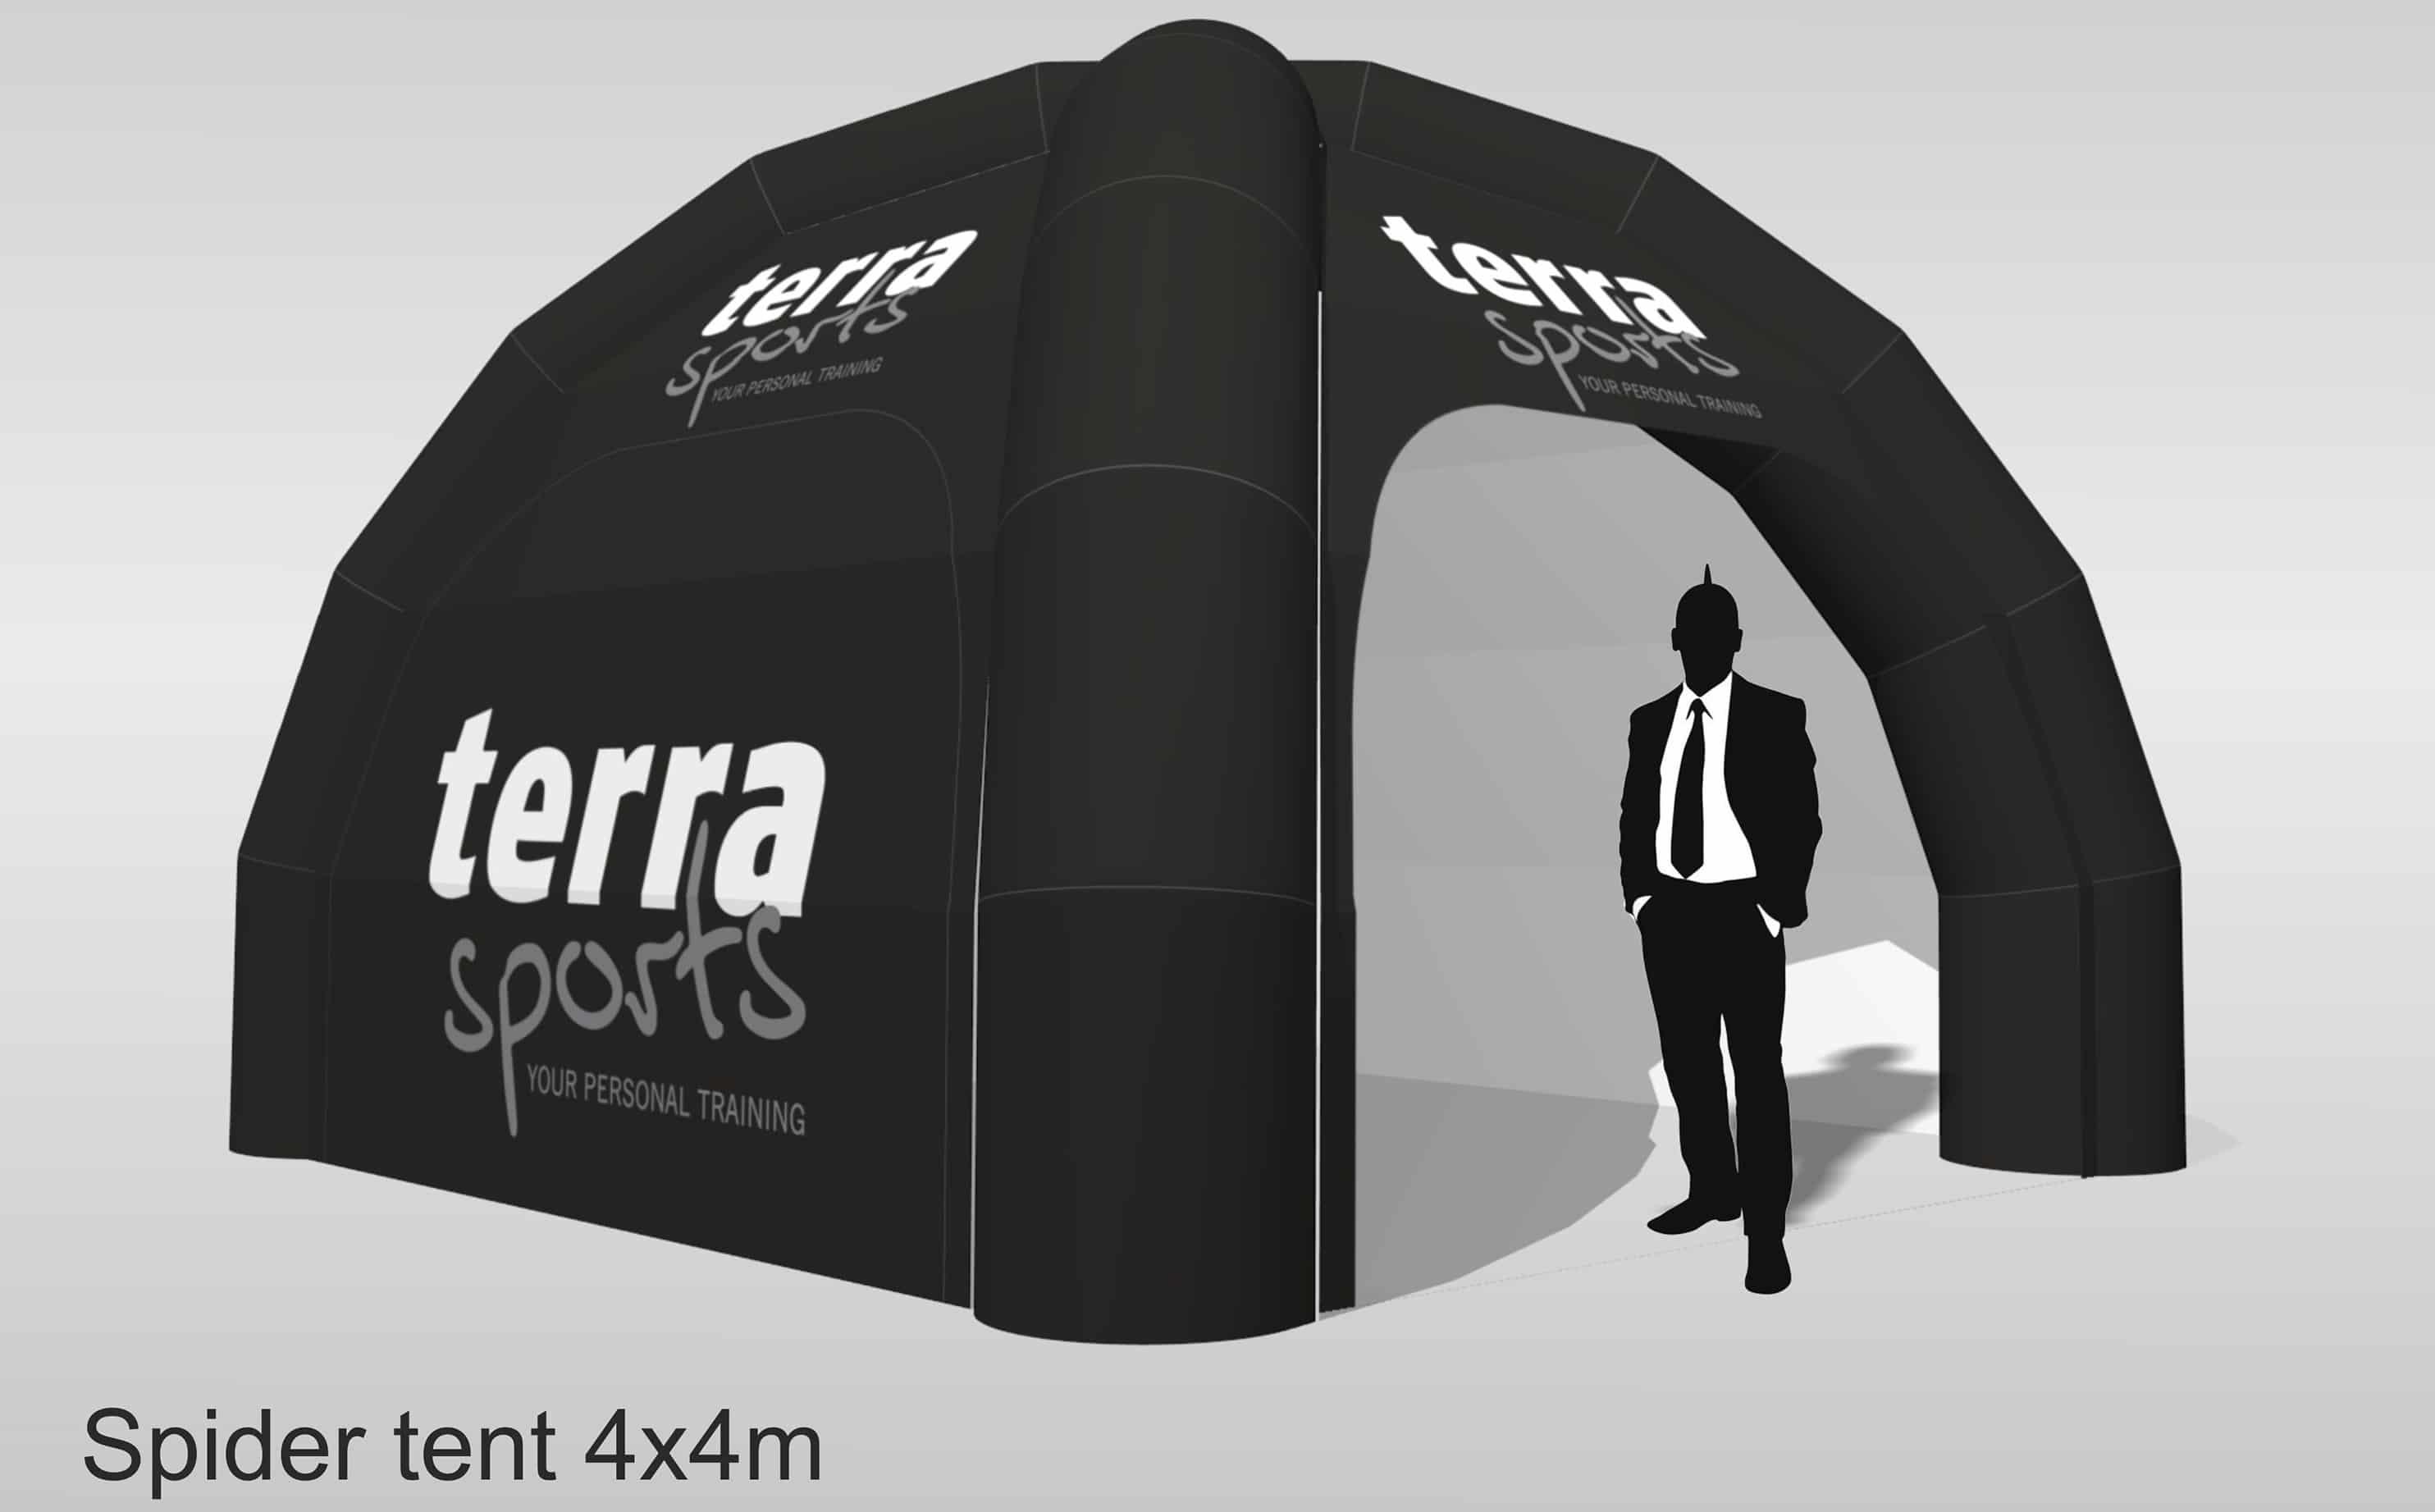 aufblasbar-zelt-terra-sports